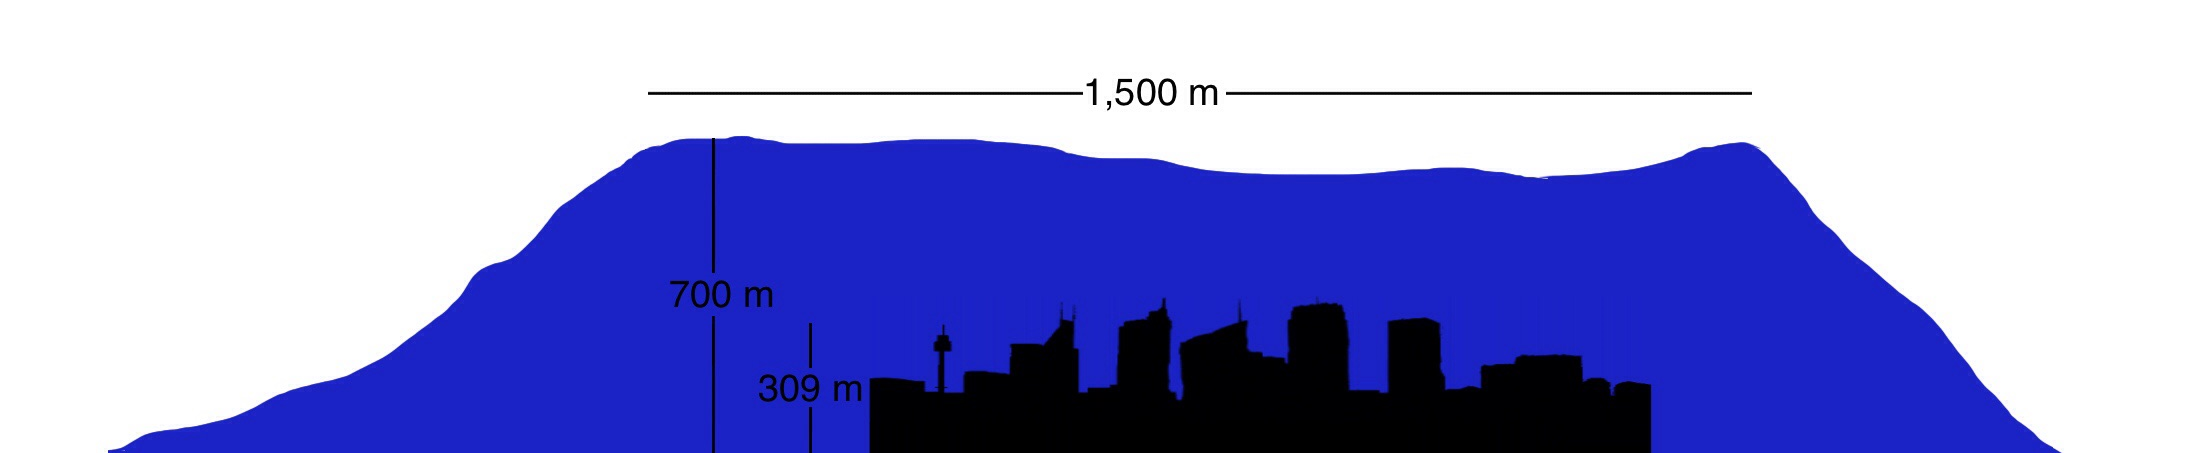 Comparison of Sydney CBD versus Sydney volcanoes